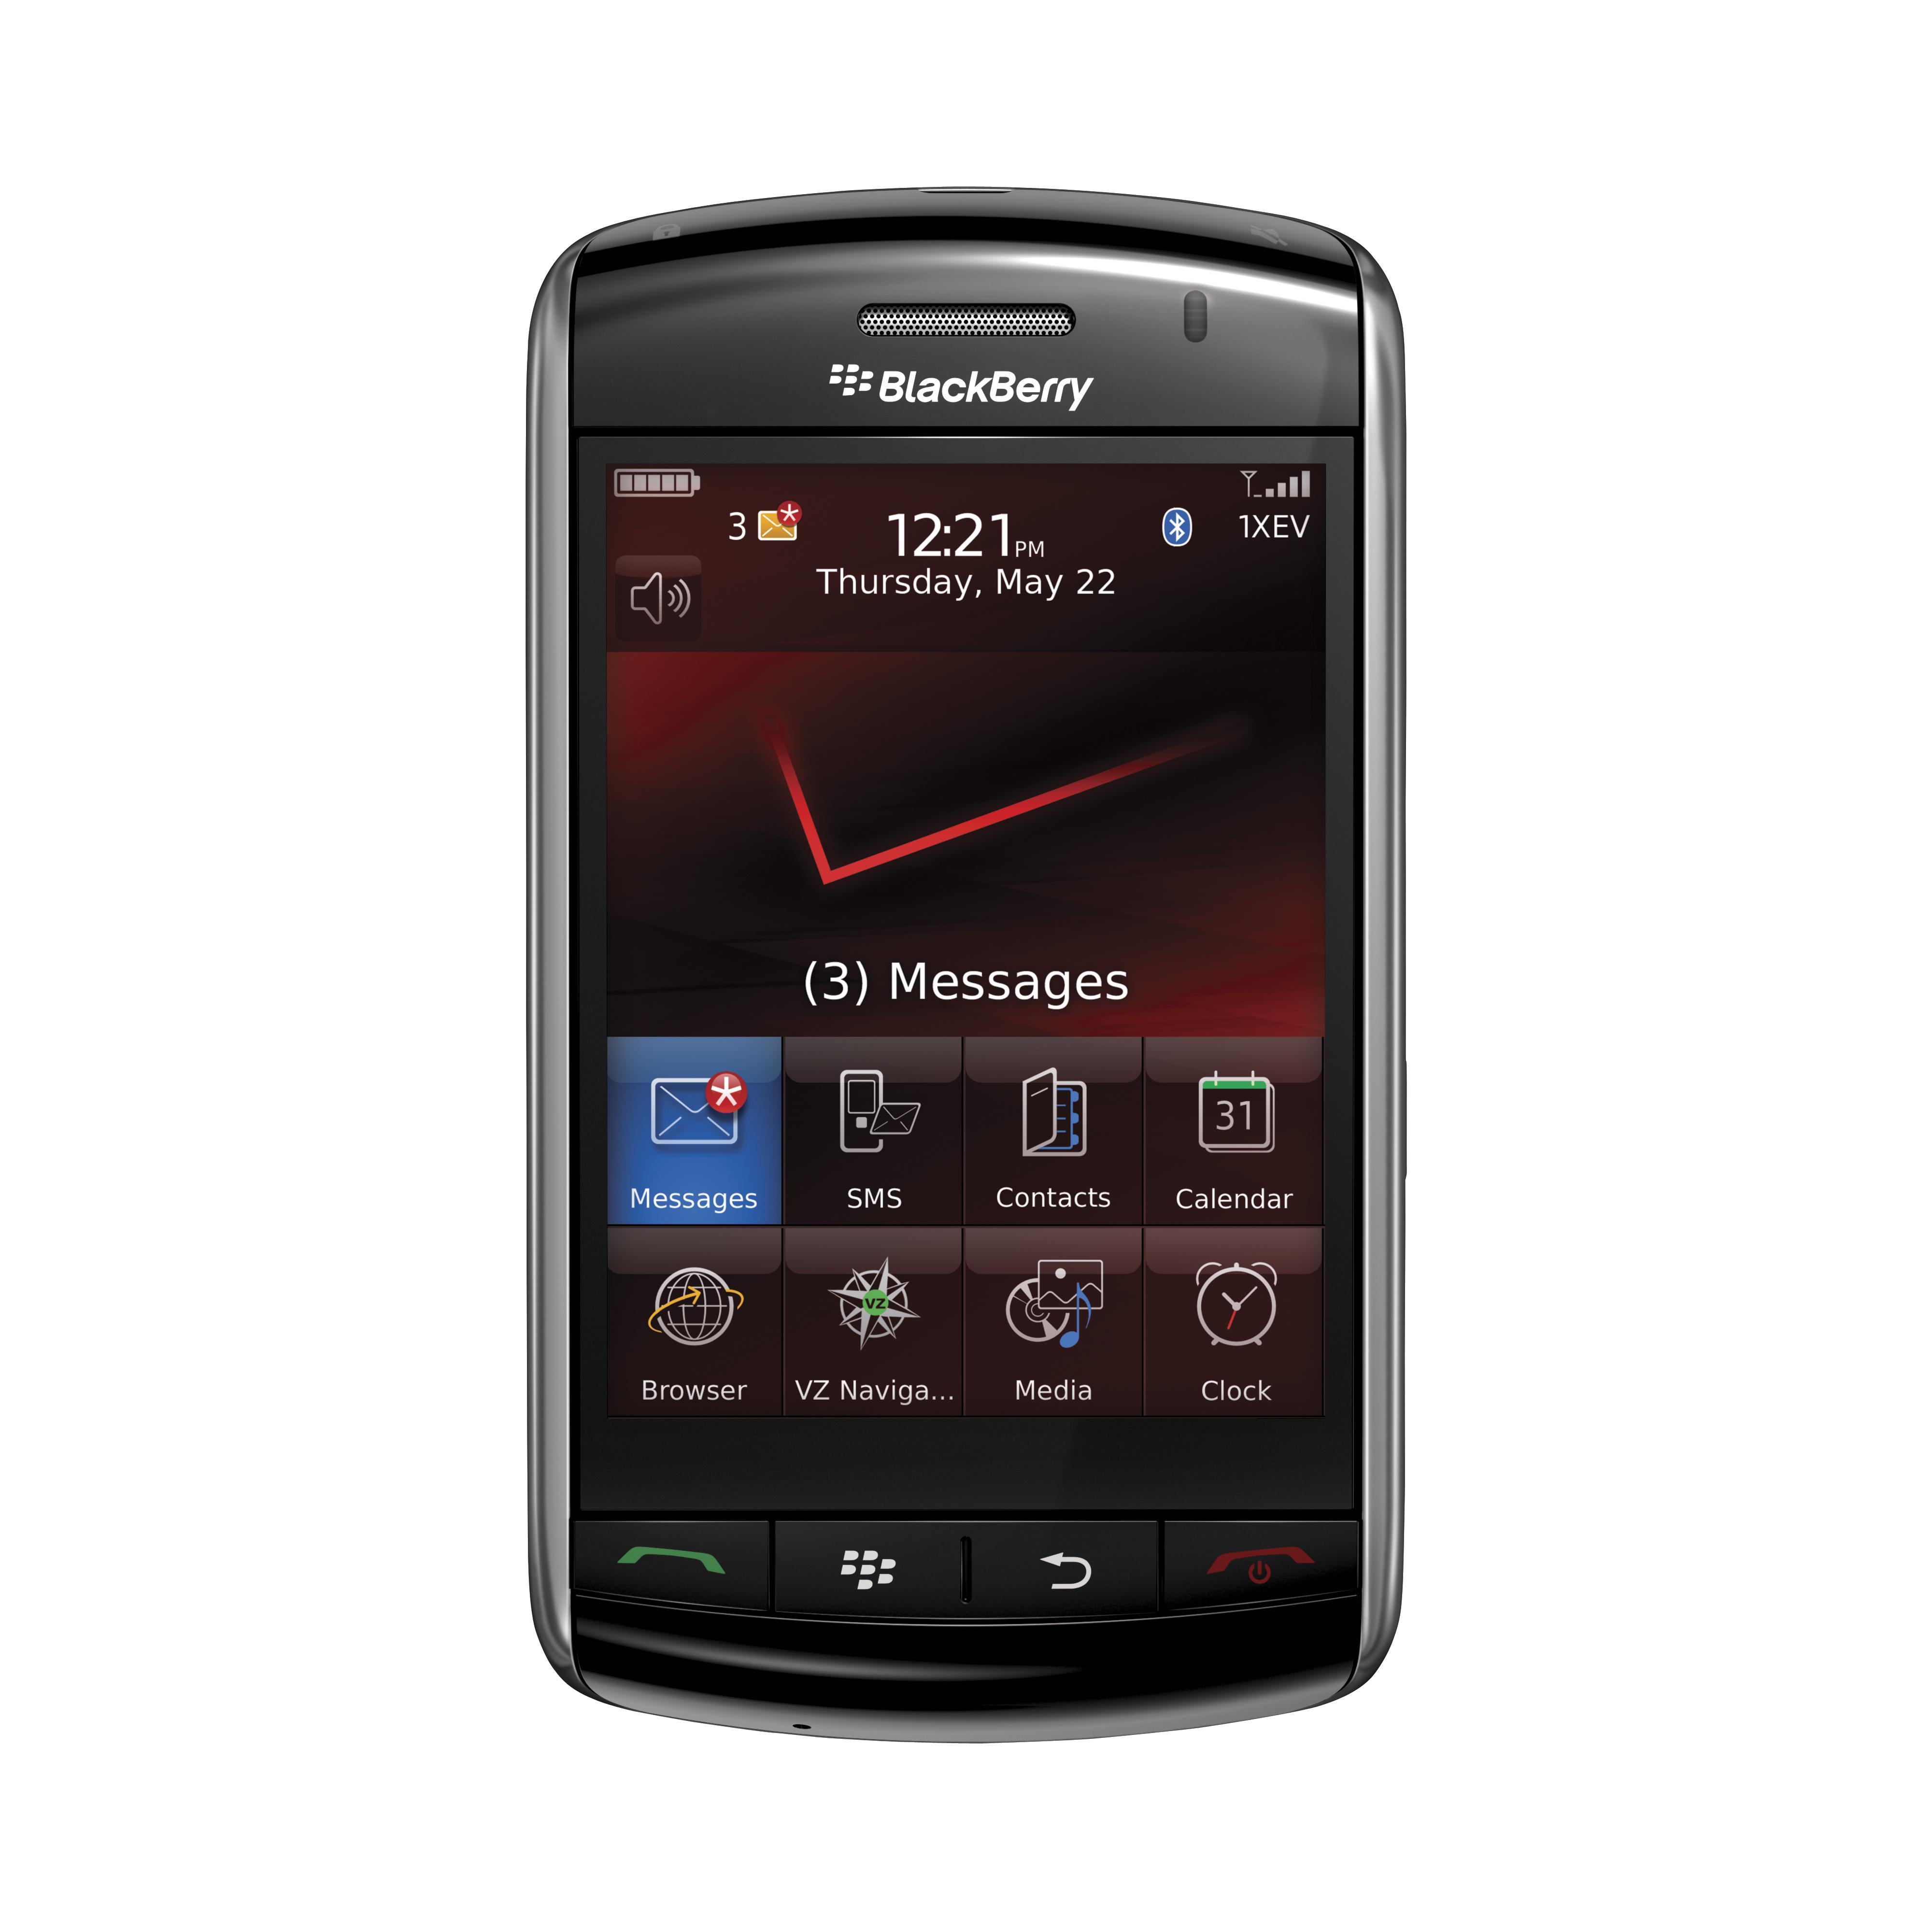 BlackBerry Storm 9530 | Verizon Community